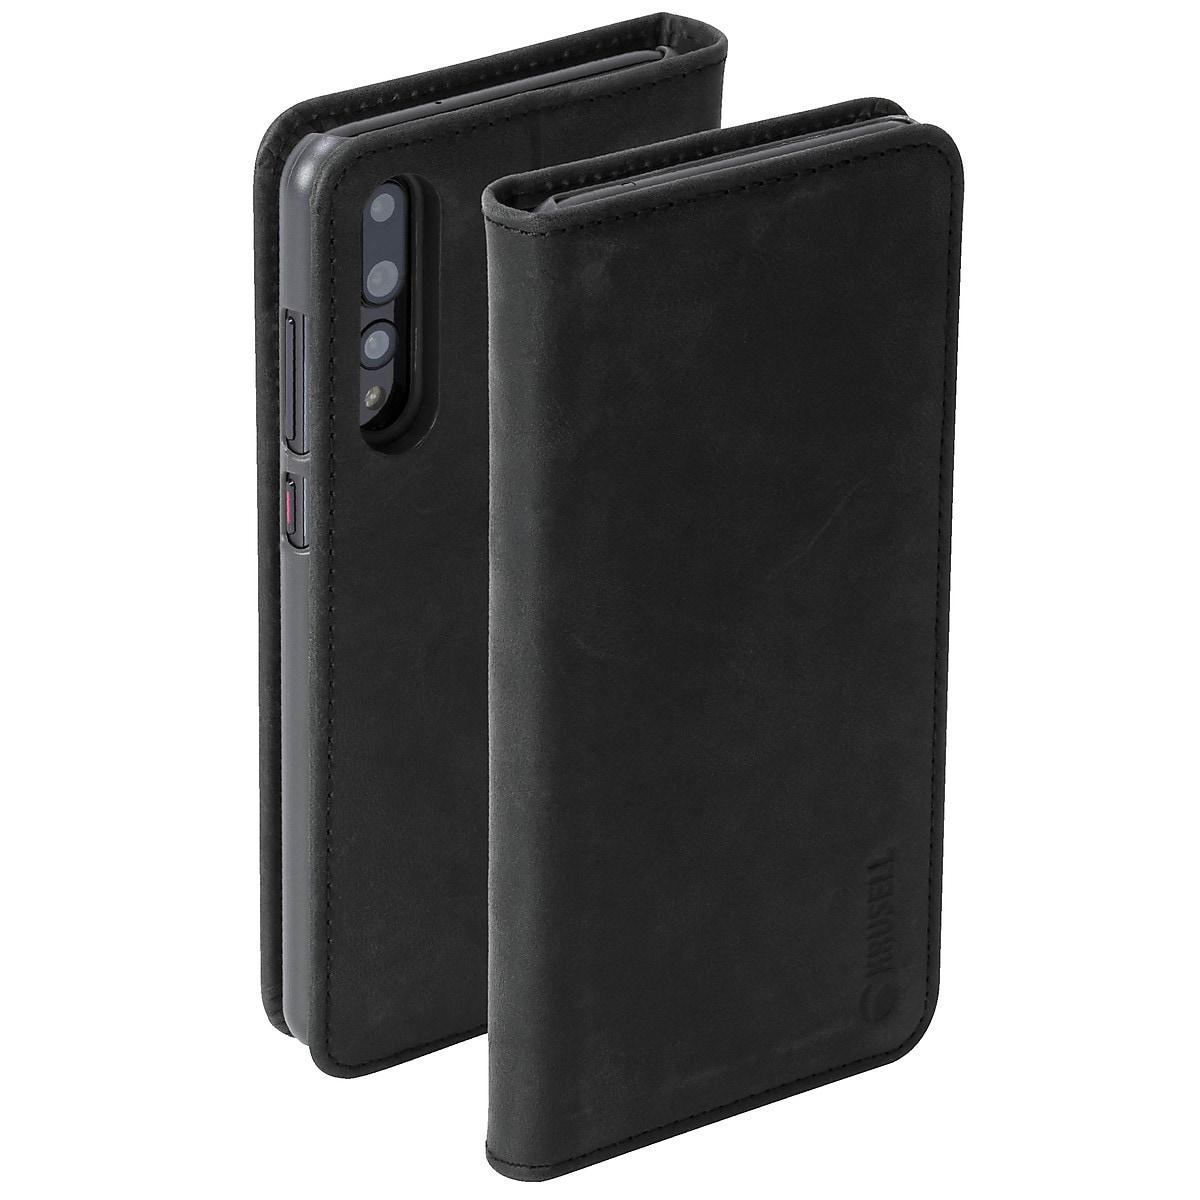 Plånboksfodral för Huawei P20 Pro, Krusell Sunne FolioWallet